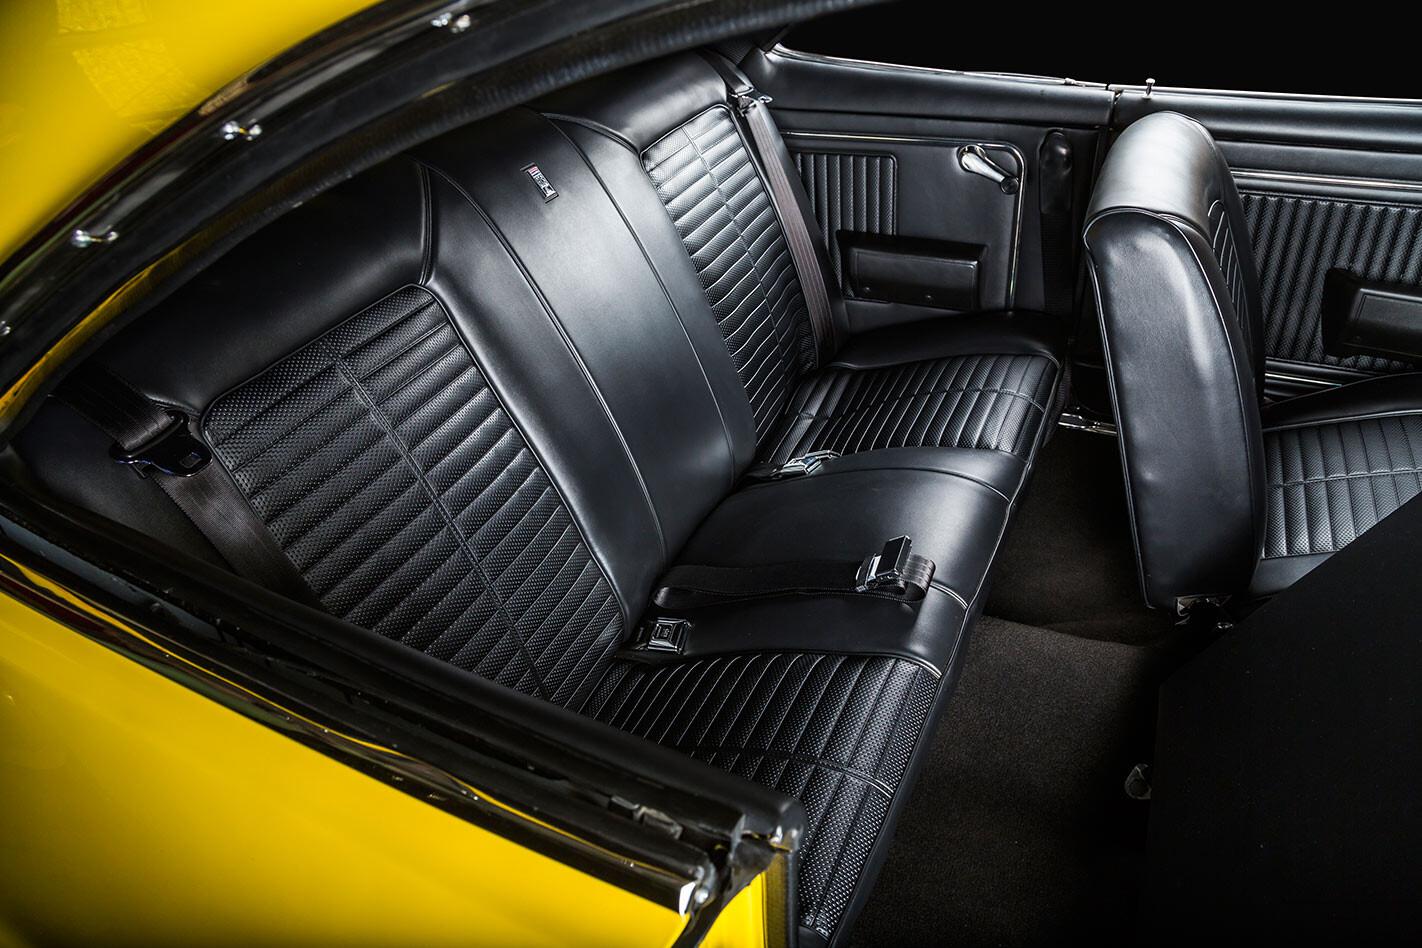 Holden HK Monaro interior rear